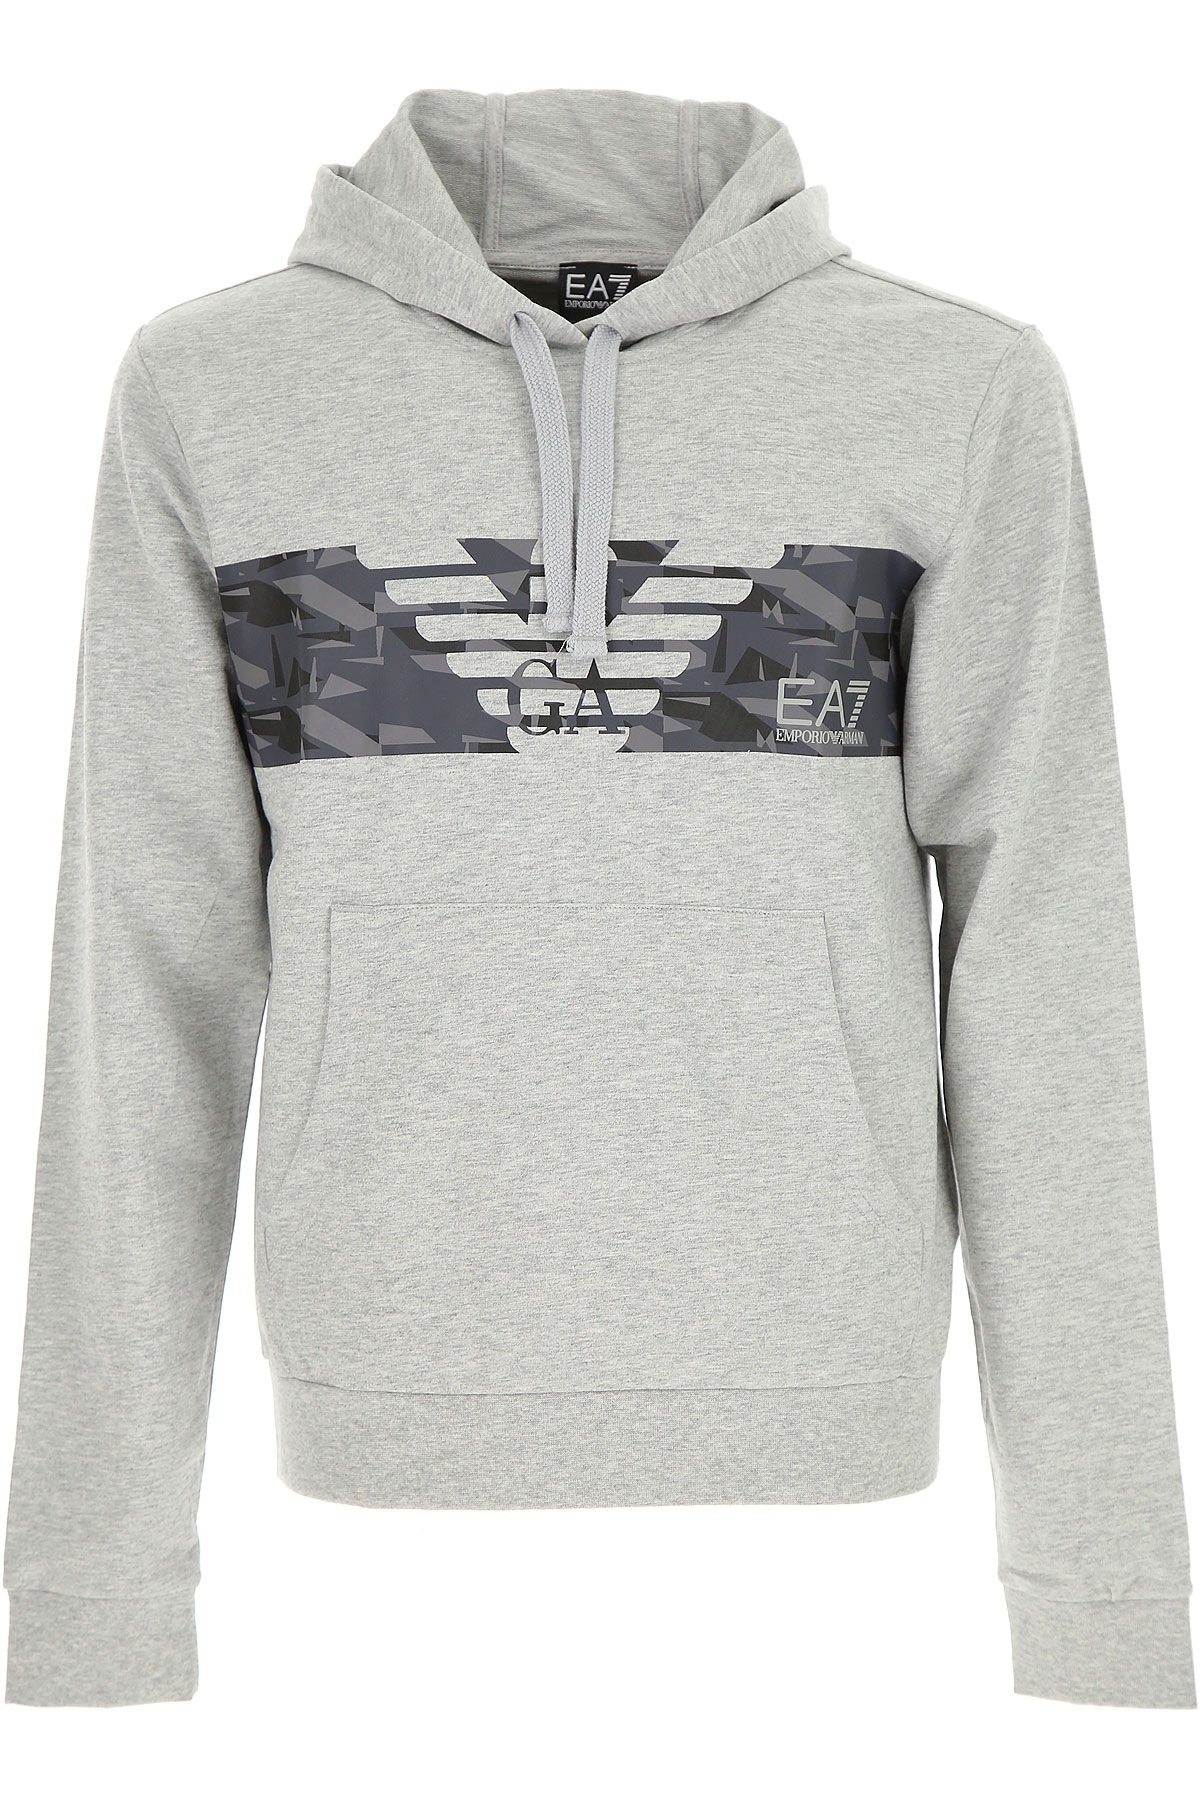 Emporio Armani Sweatshirt for Men On Sale, Light Grey Melange, Cotton, 2017, L M XL XXL USA-449478